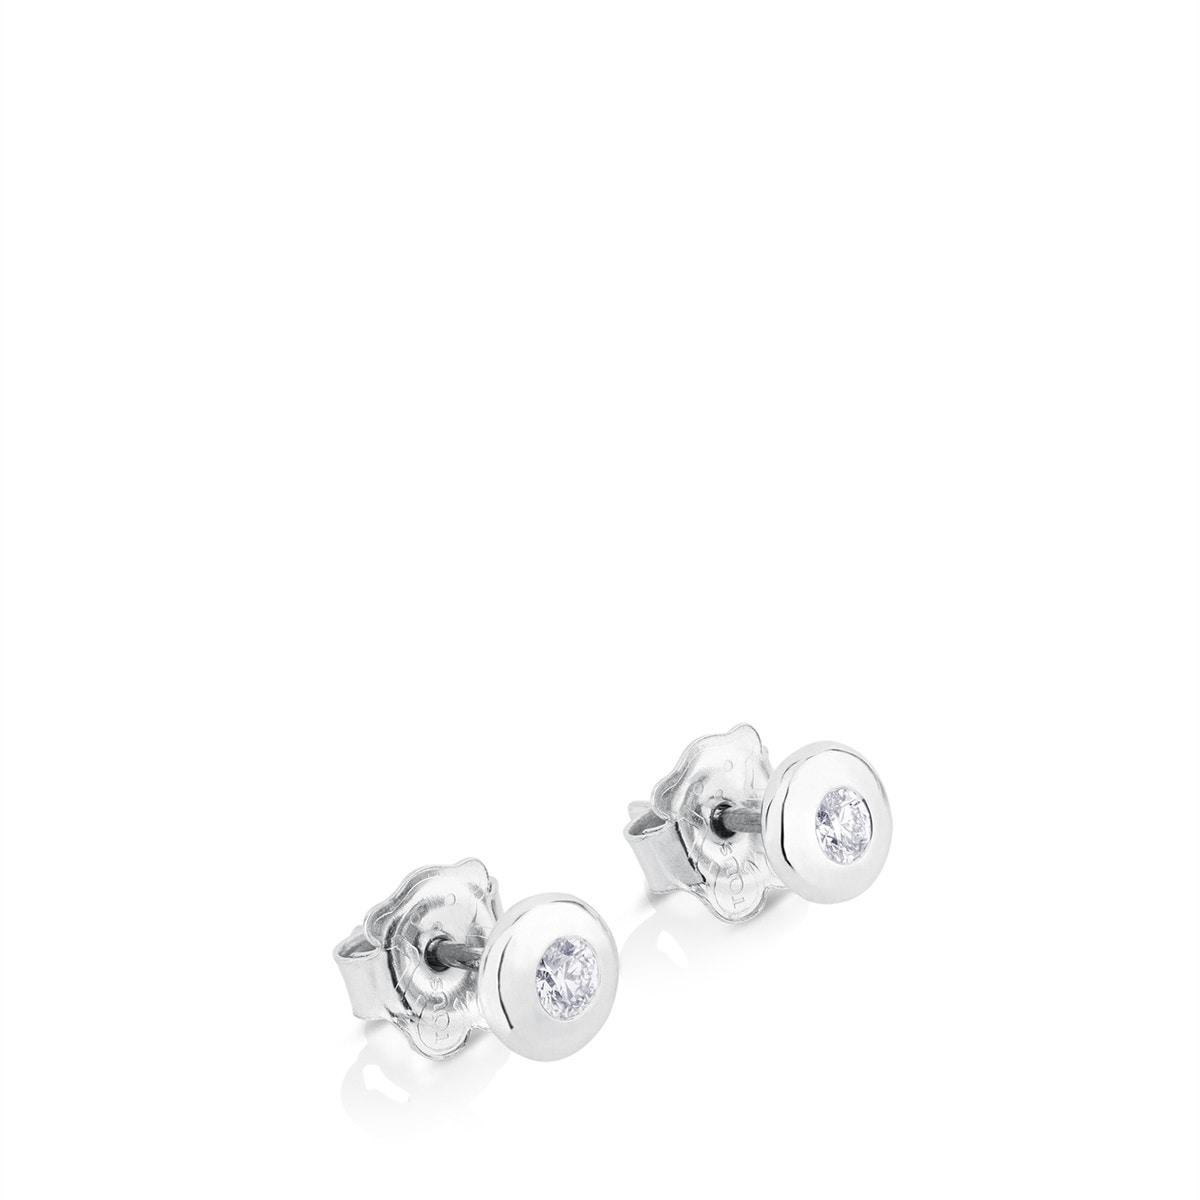 9fab579a8978 Pendientes TOUS Diamonds de Oro blanco con Diamantes - Tous Site ...